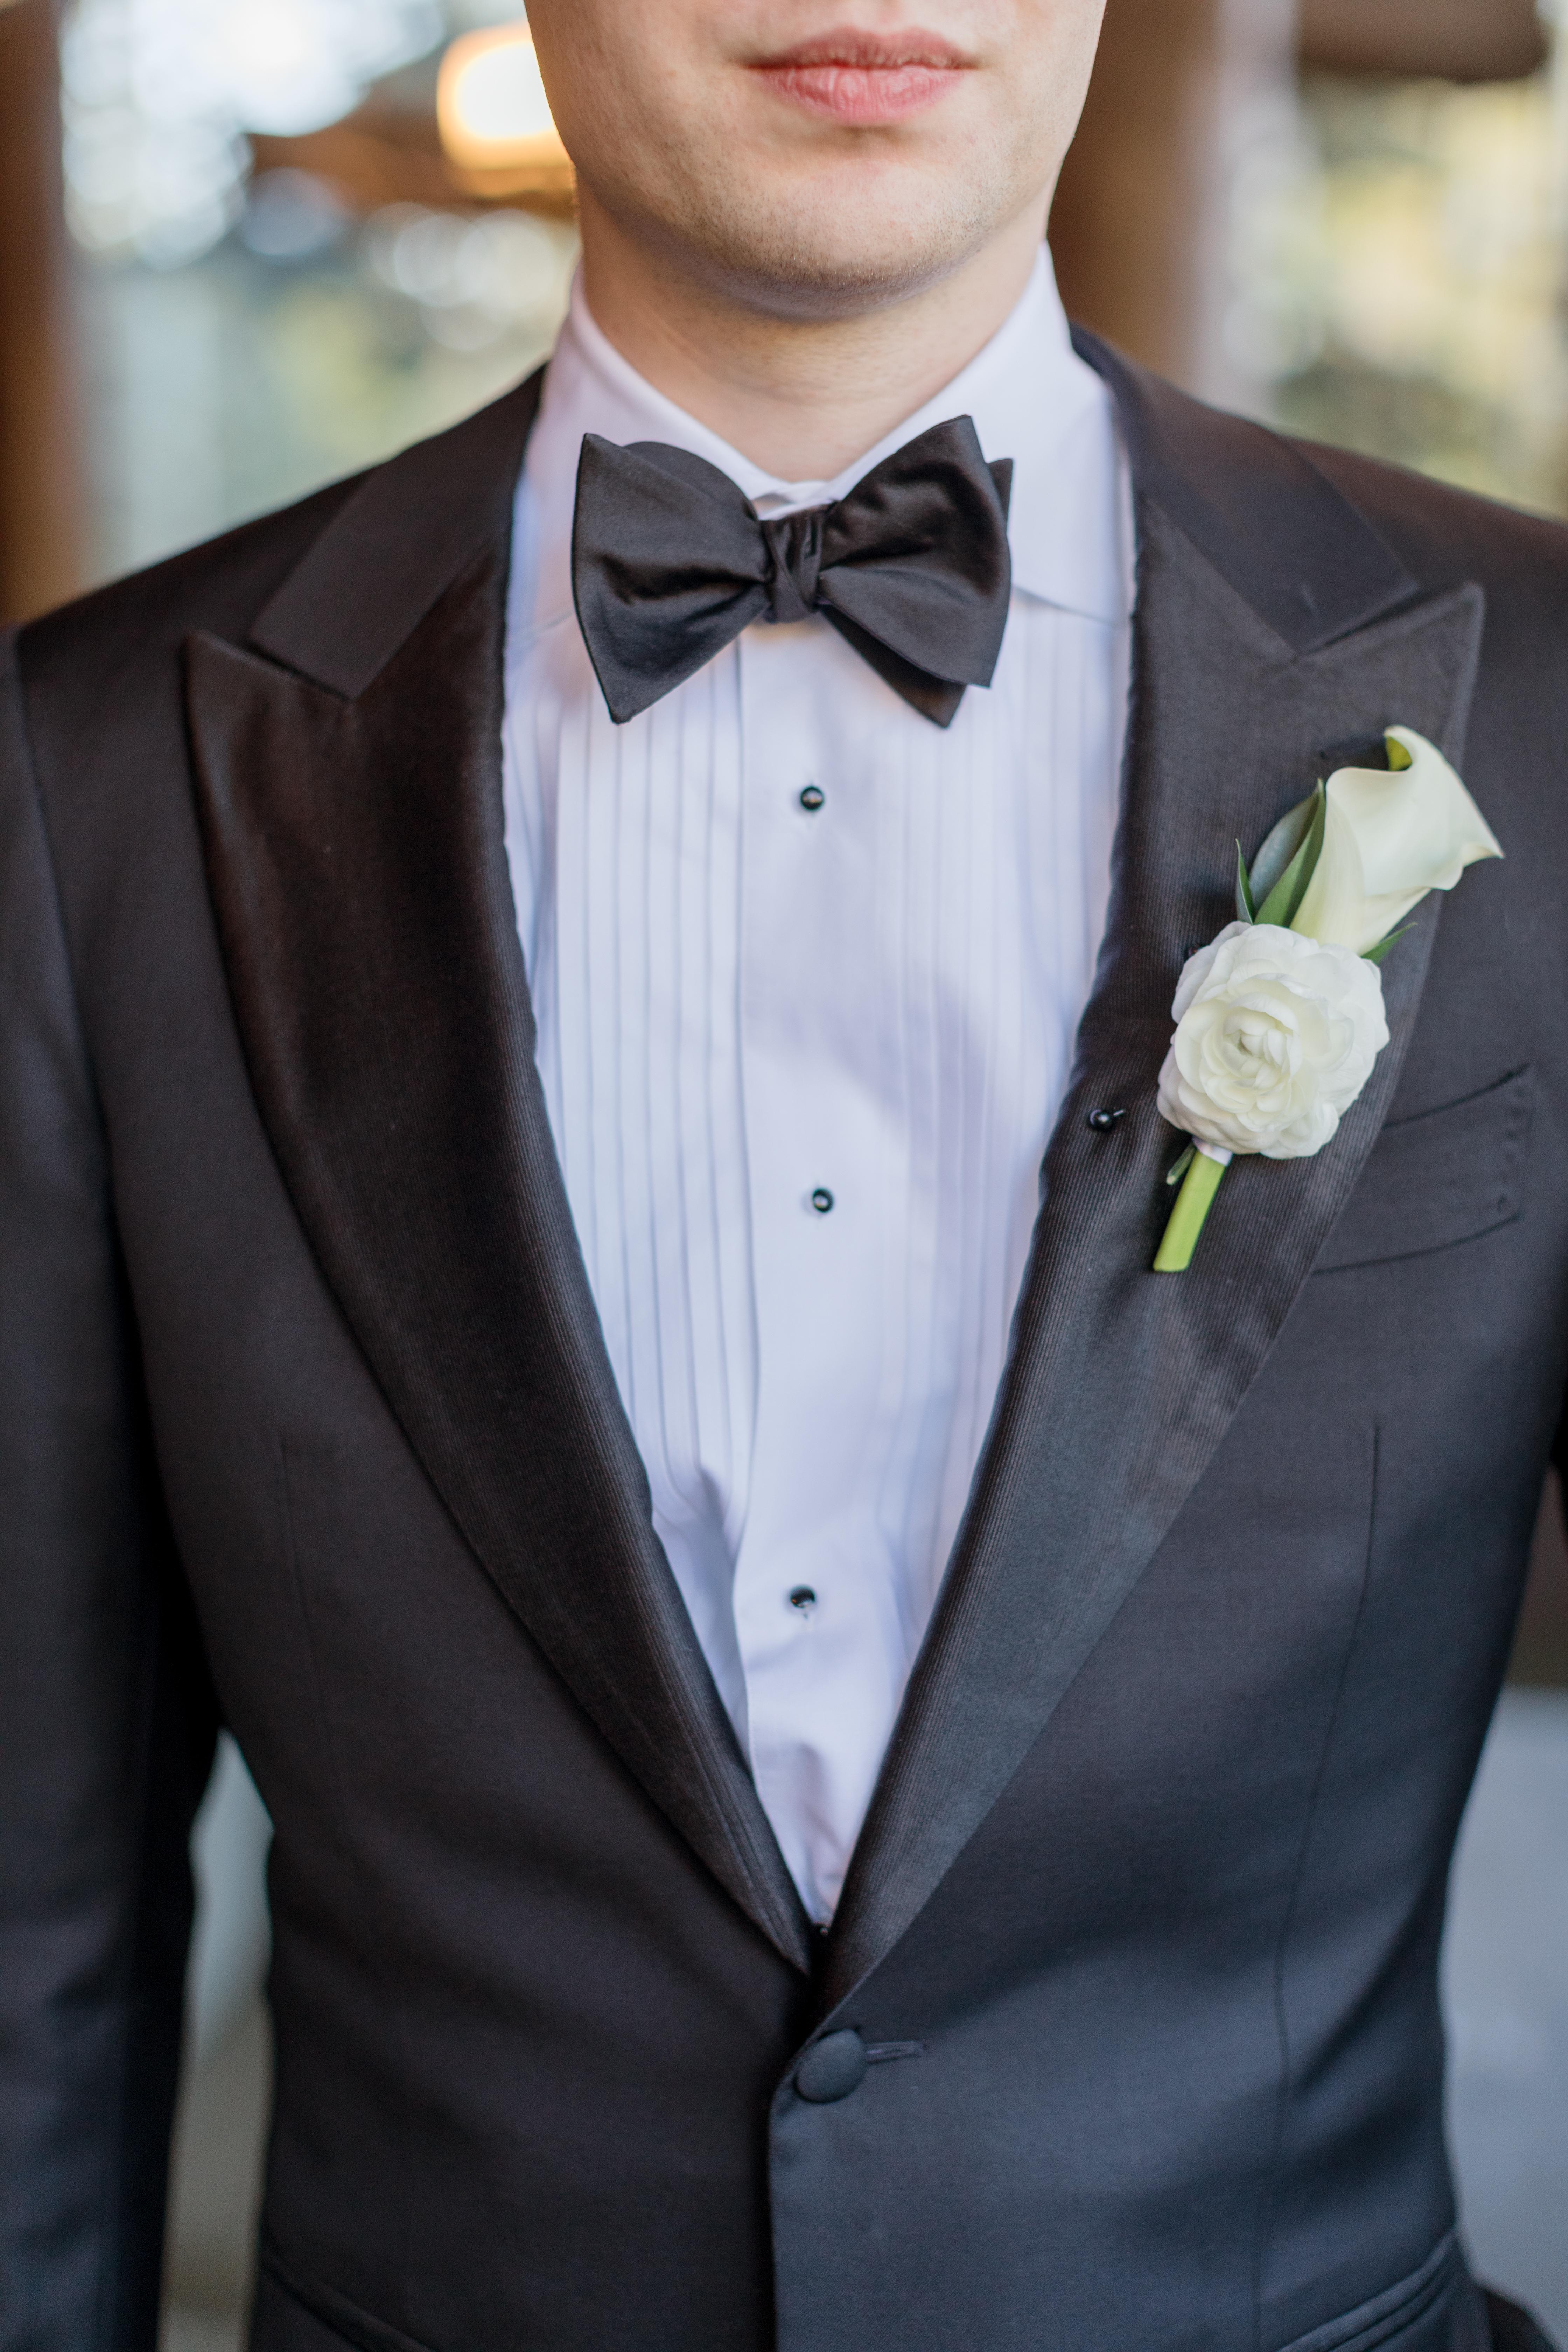 Ritz-Carlton-Bachelor-Gulch-Beaver-Creek-Colorado-Fall-Wedding-Groom-Boutonniere